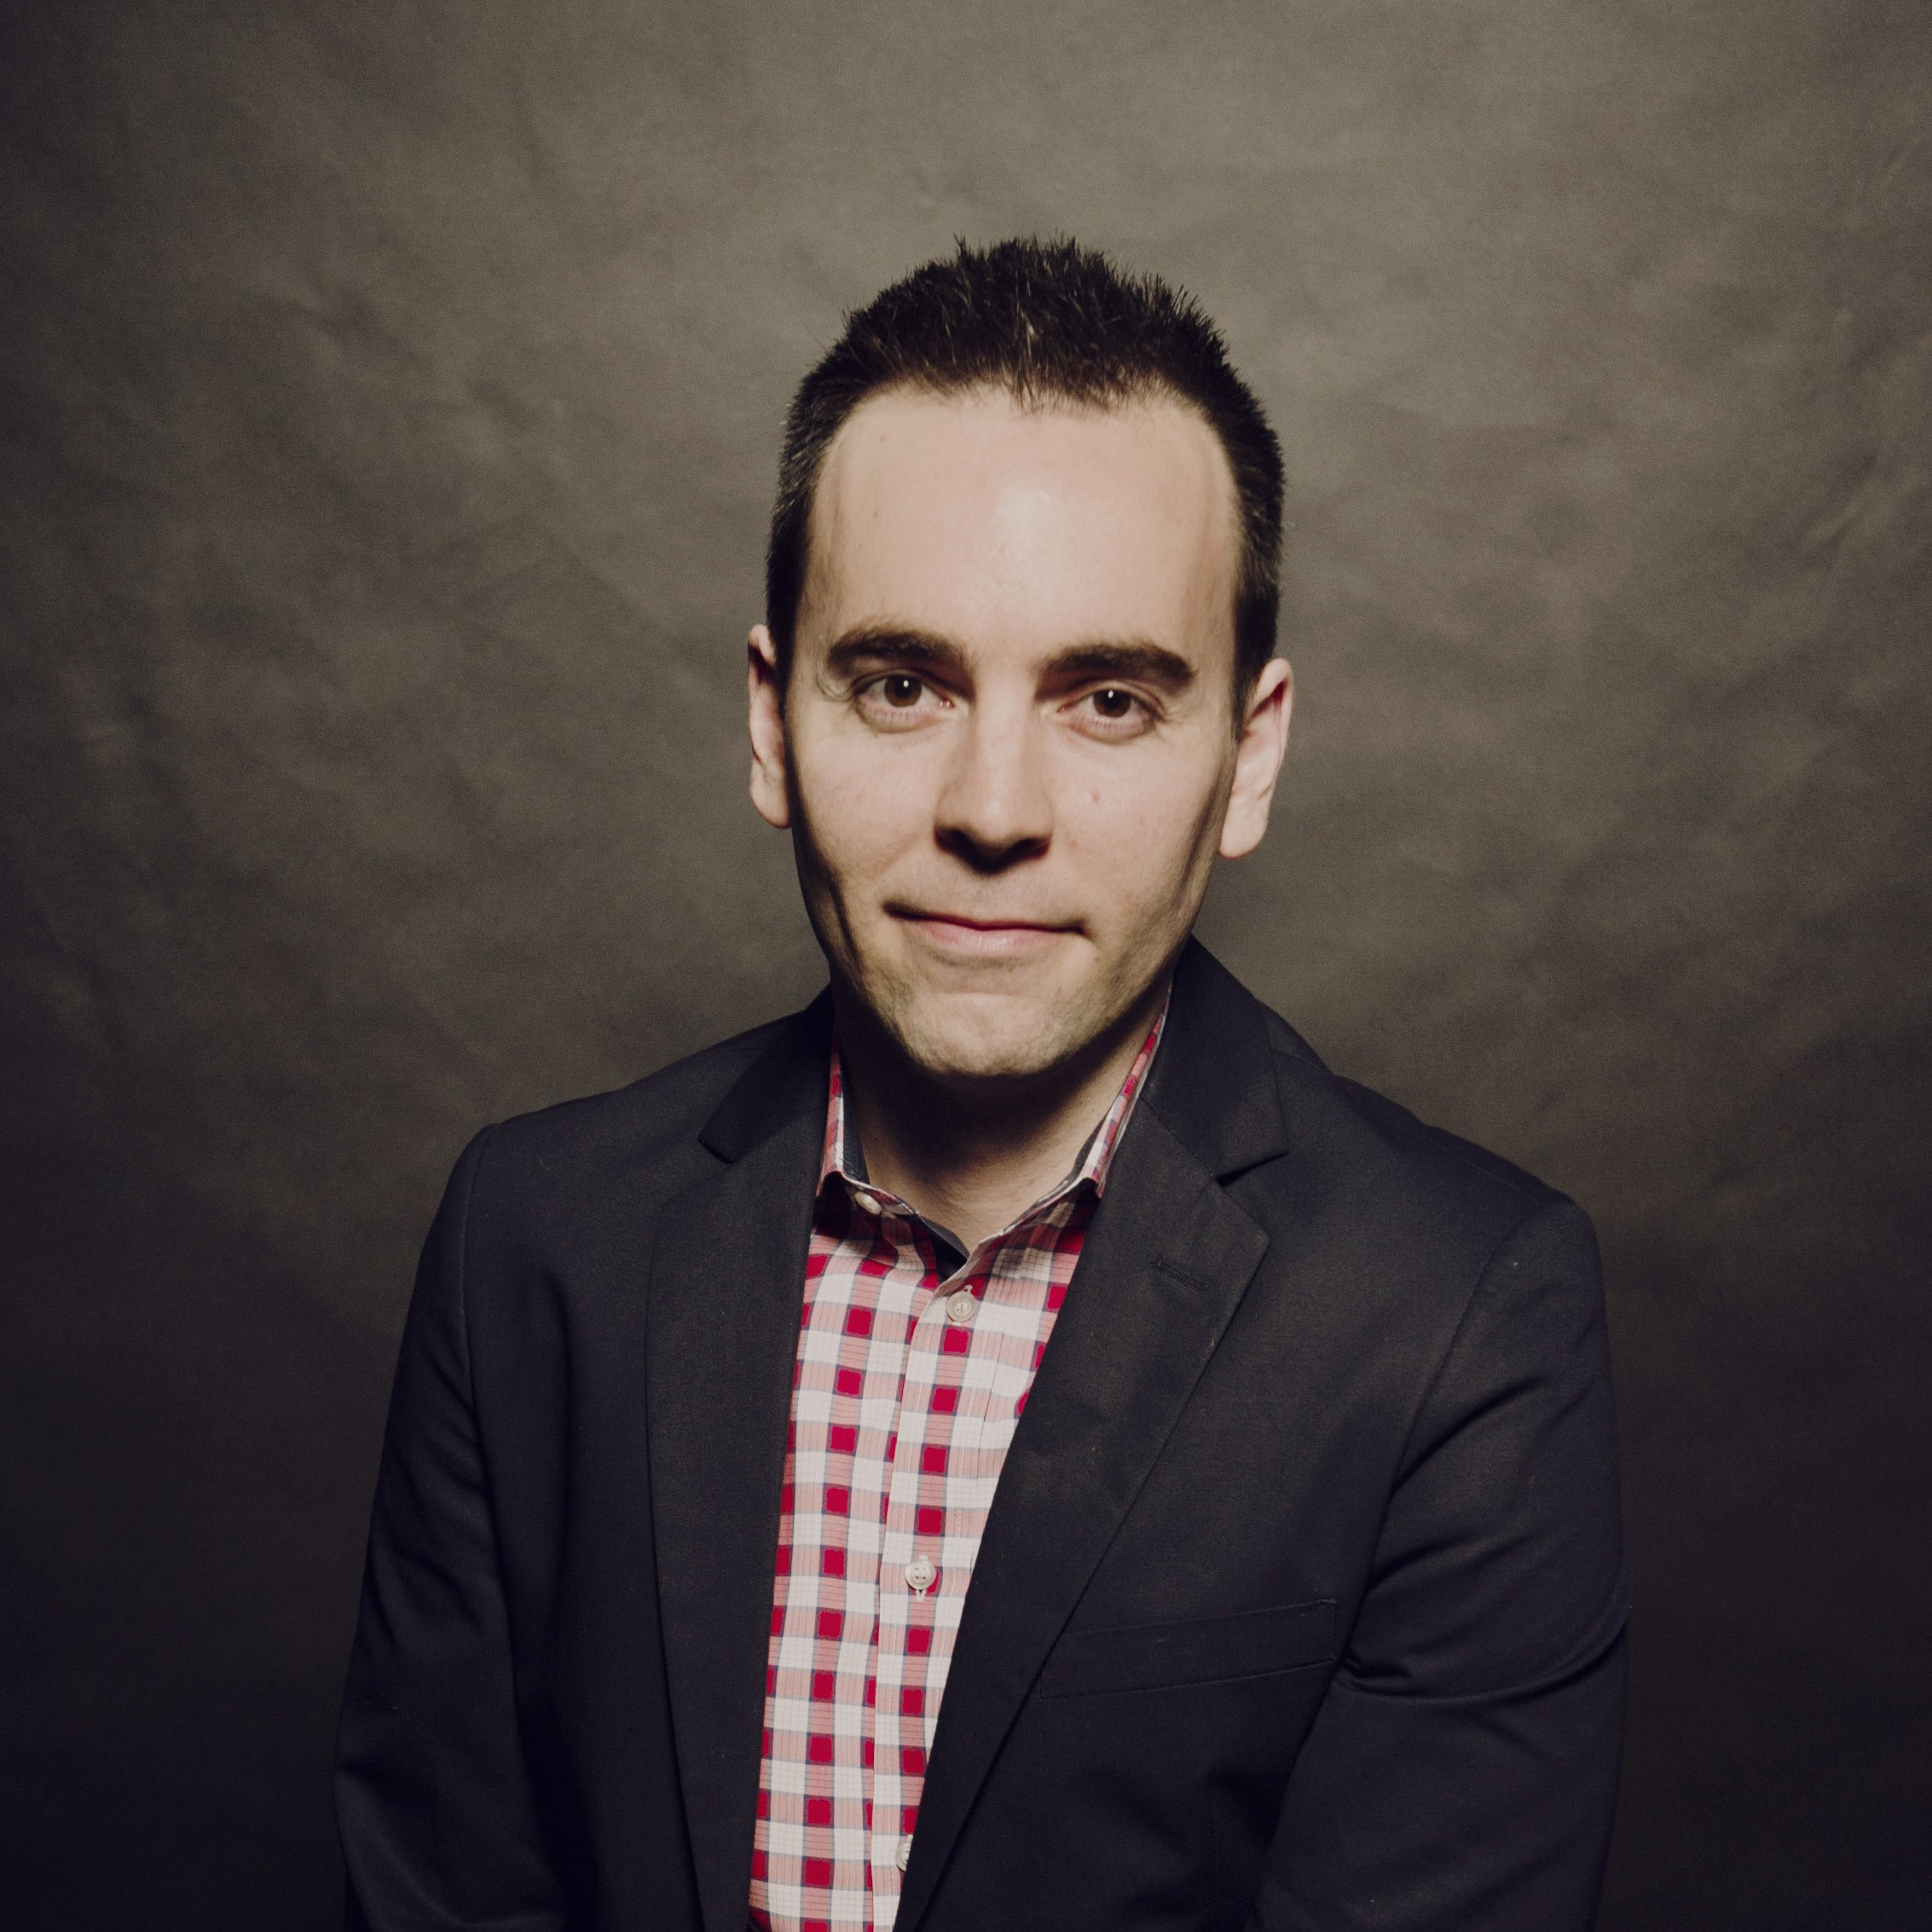 Nick McEwan-Hall